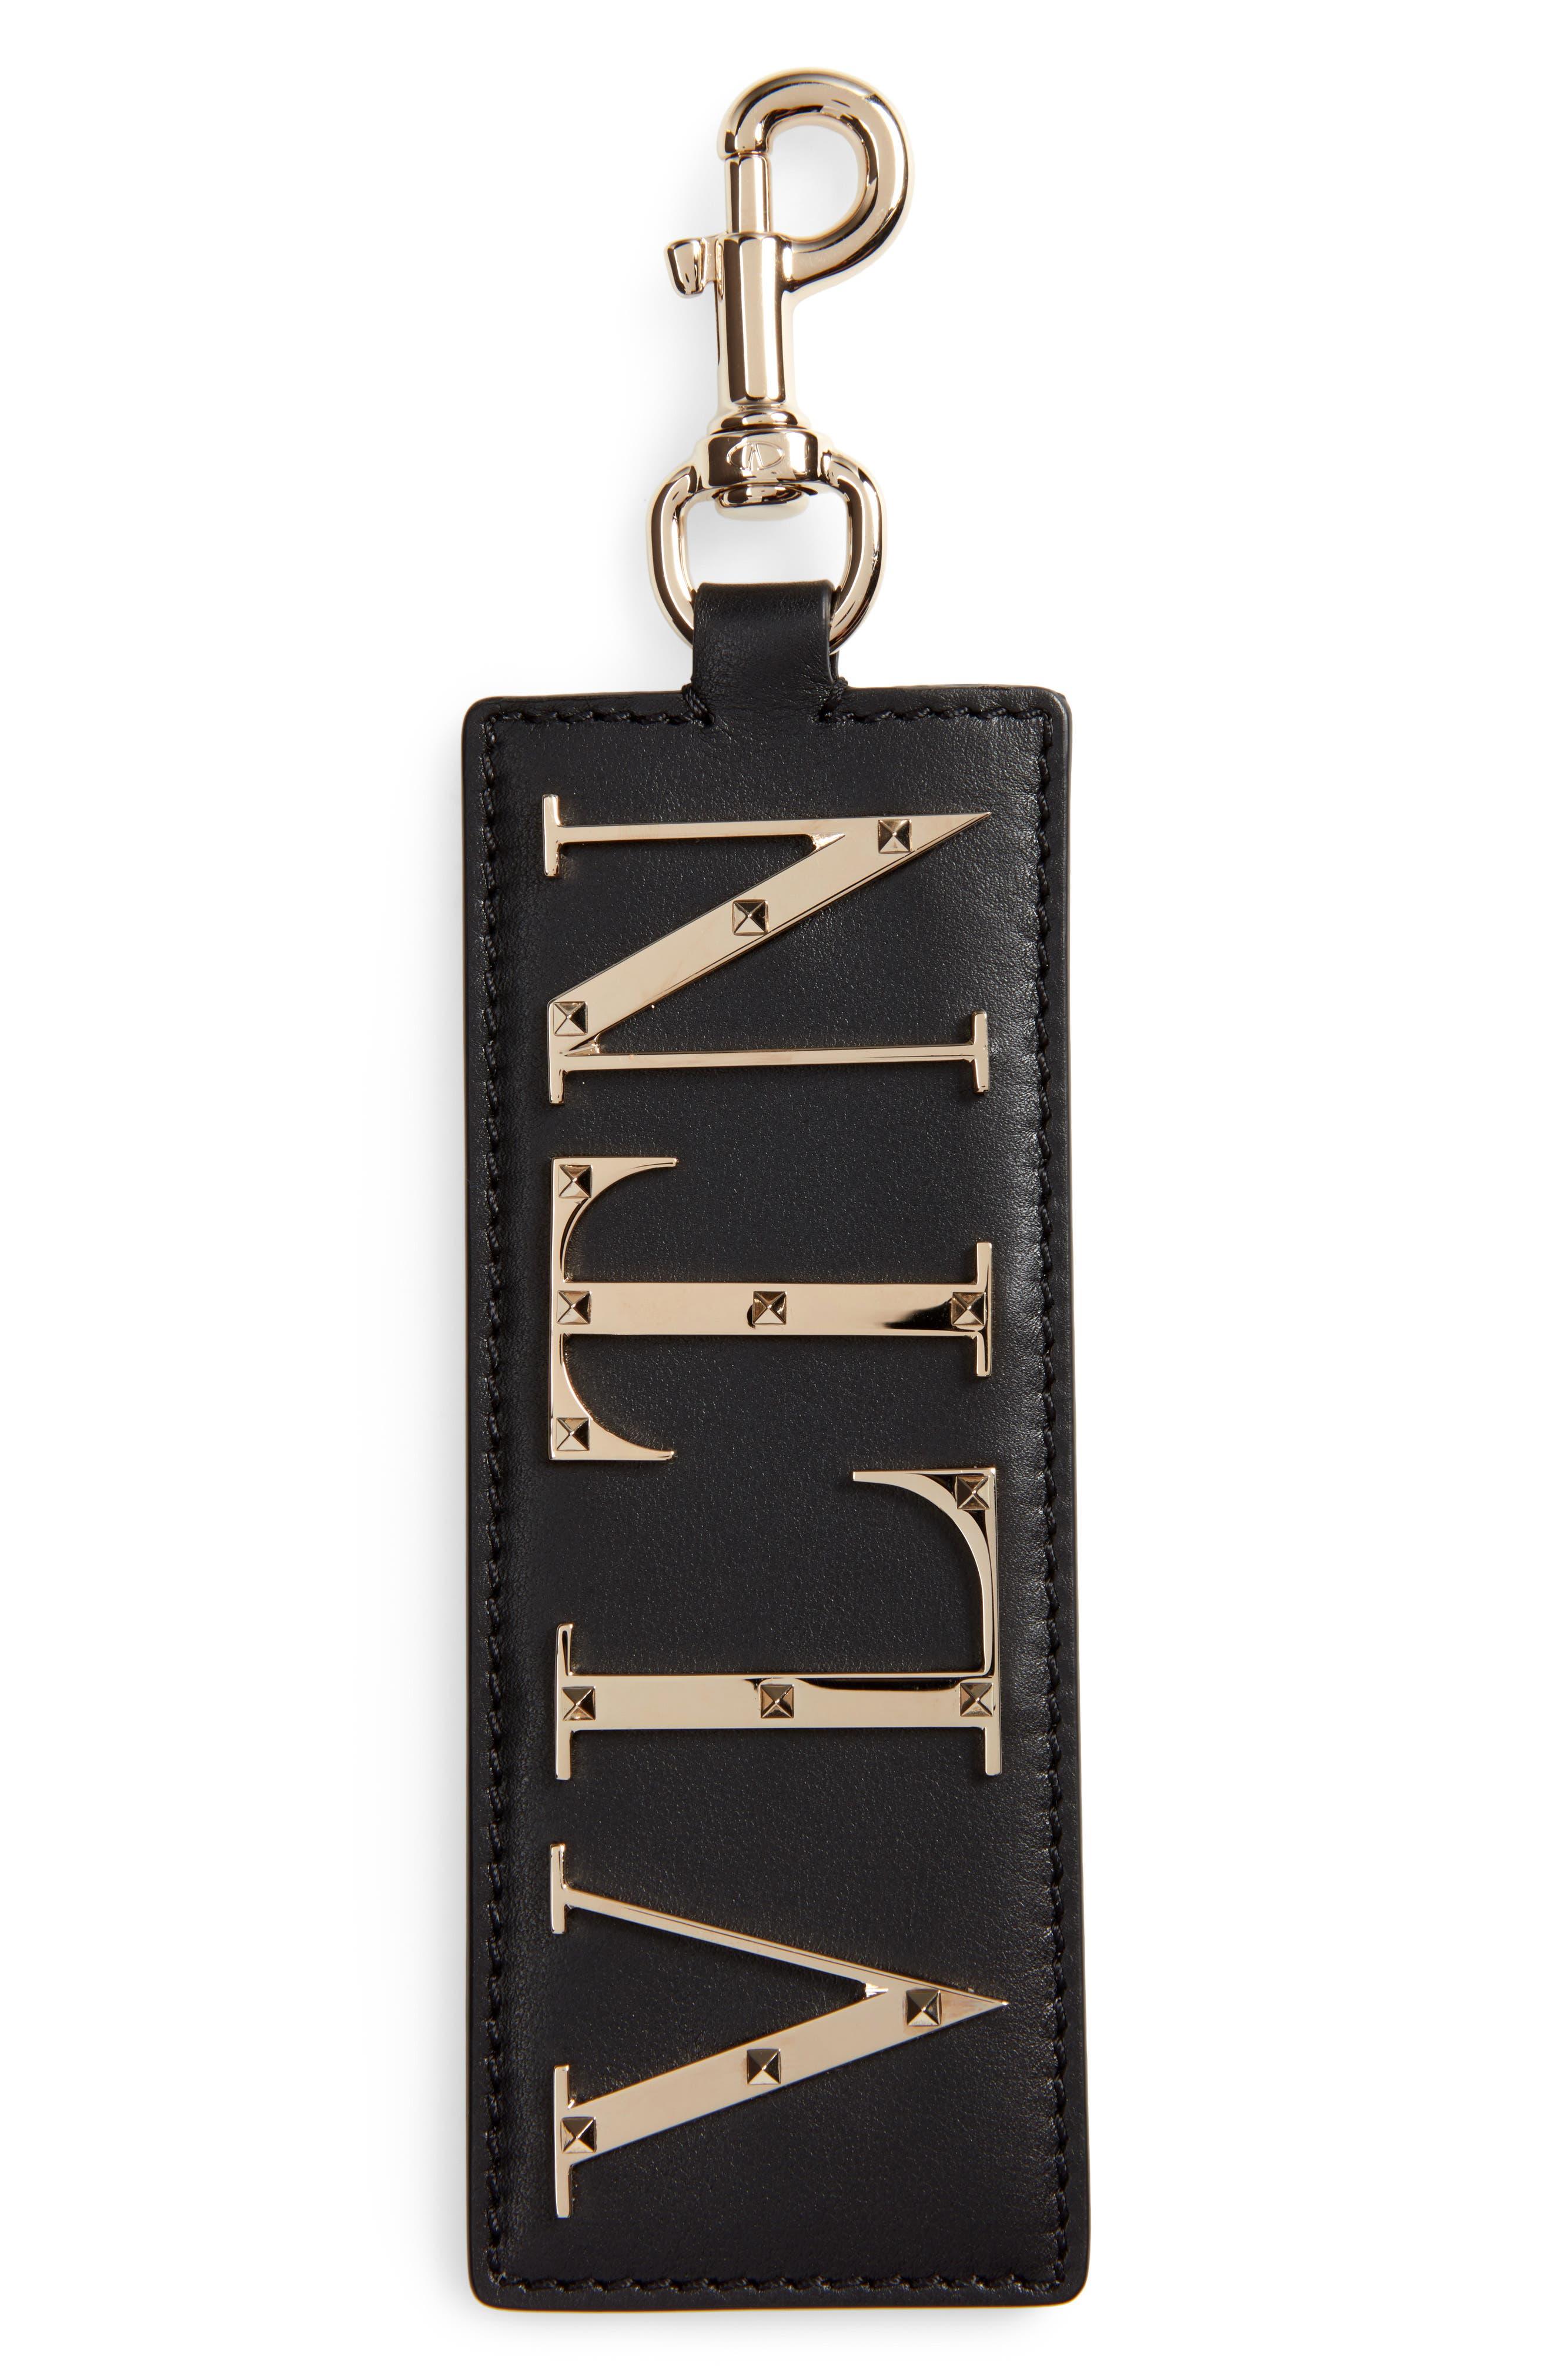 VALENTINO GARAVANI Logo Leather Bag Charm/Key Holder